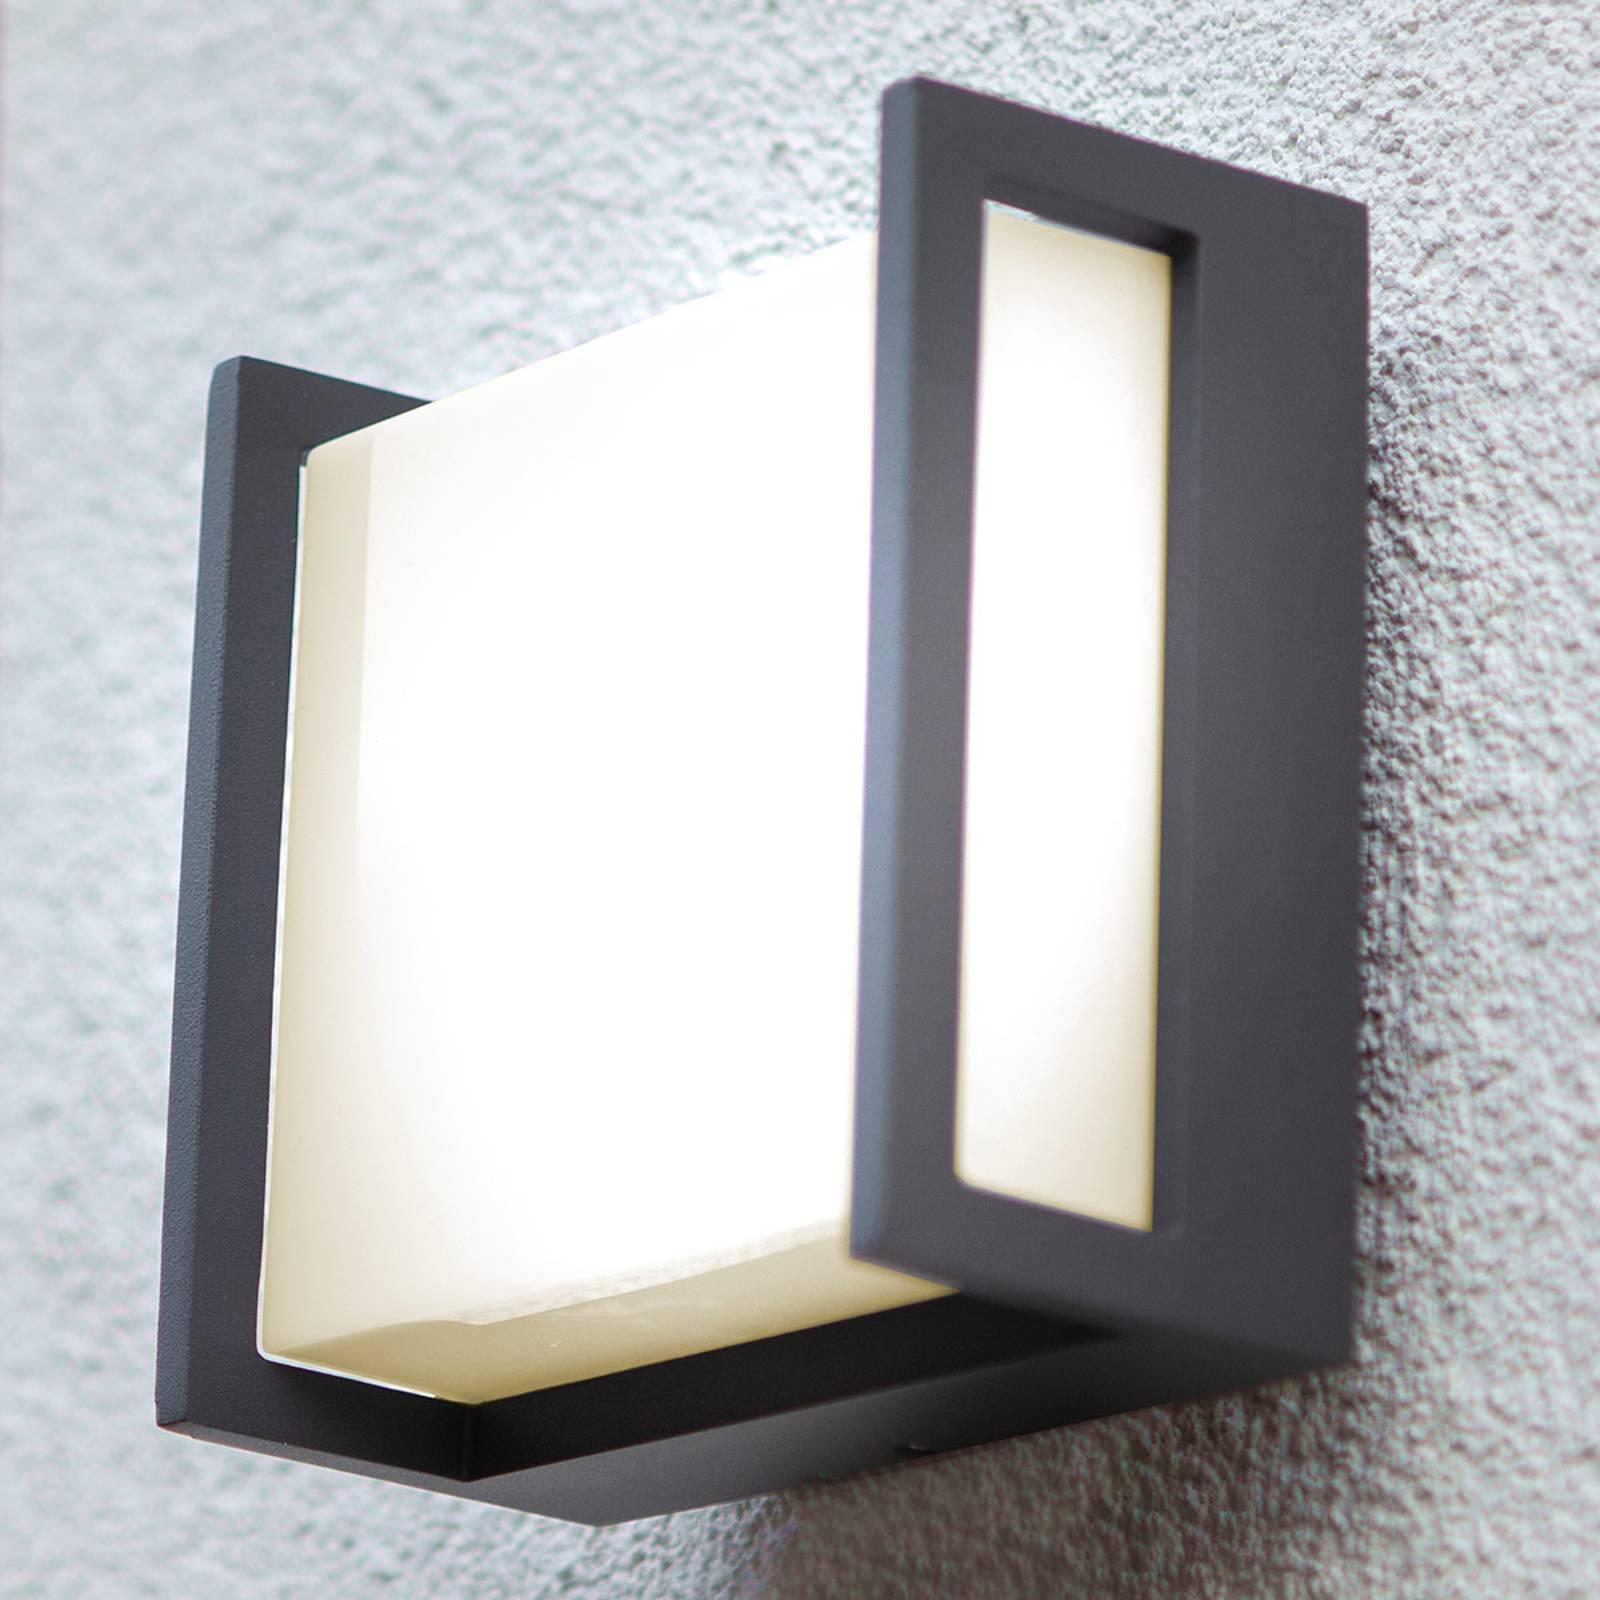 LED buitenwandlamp Qubo, 14cm x 14cm